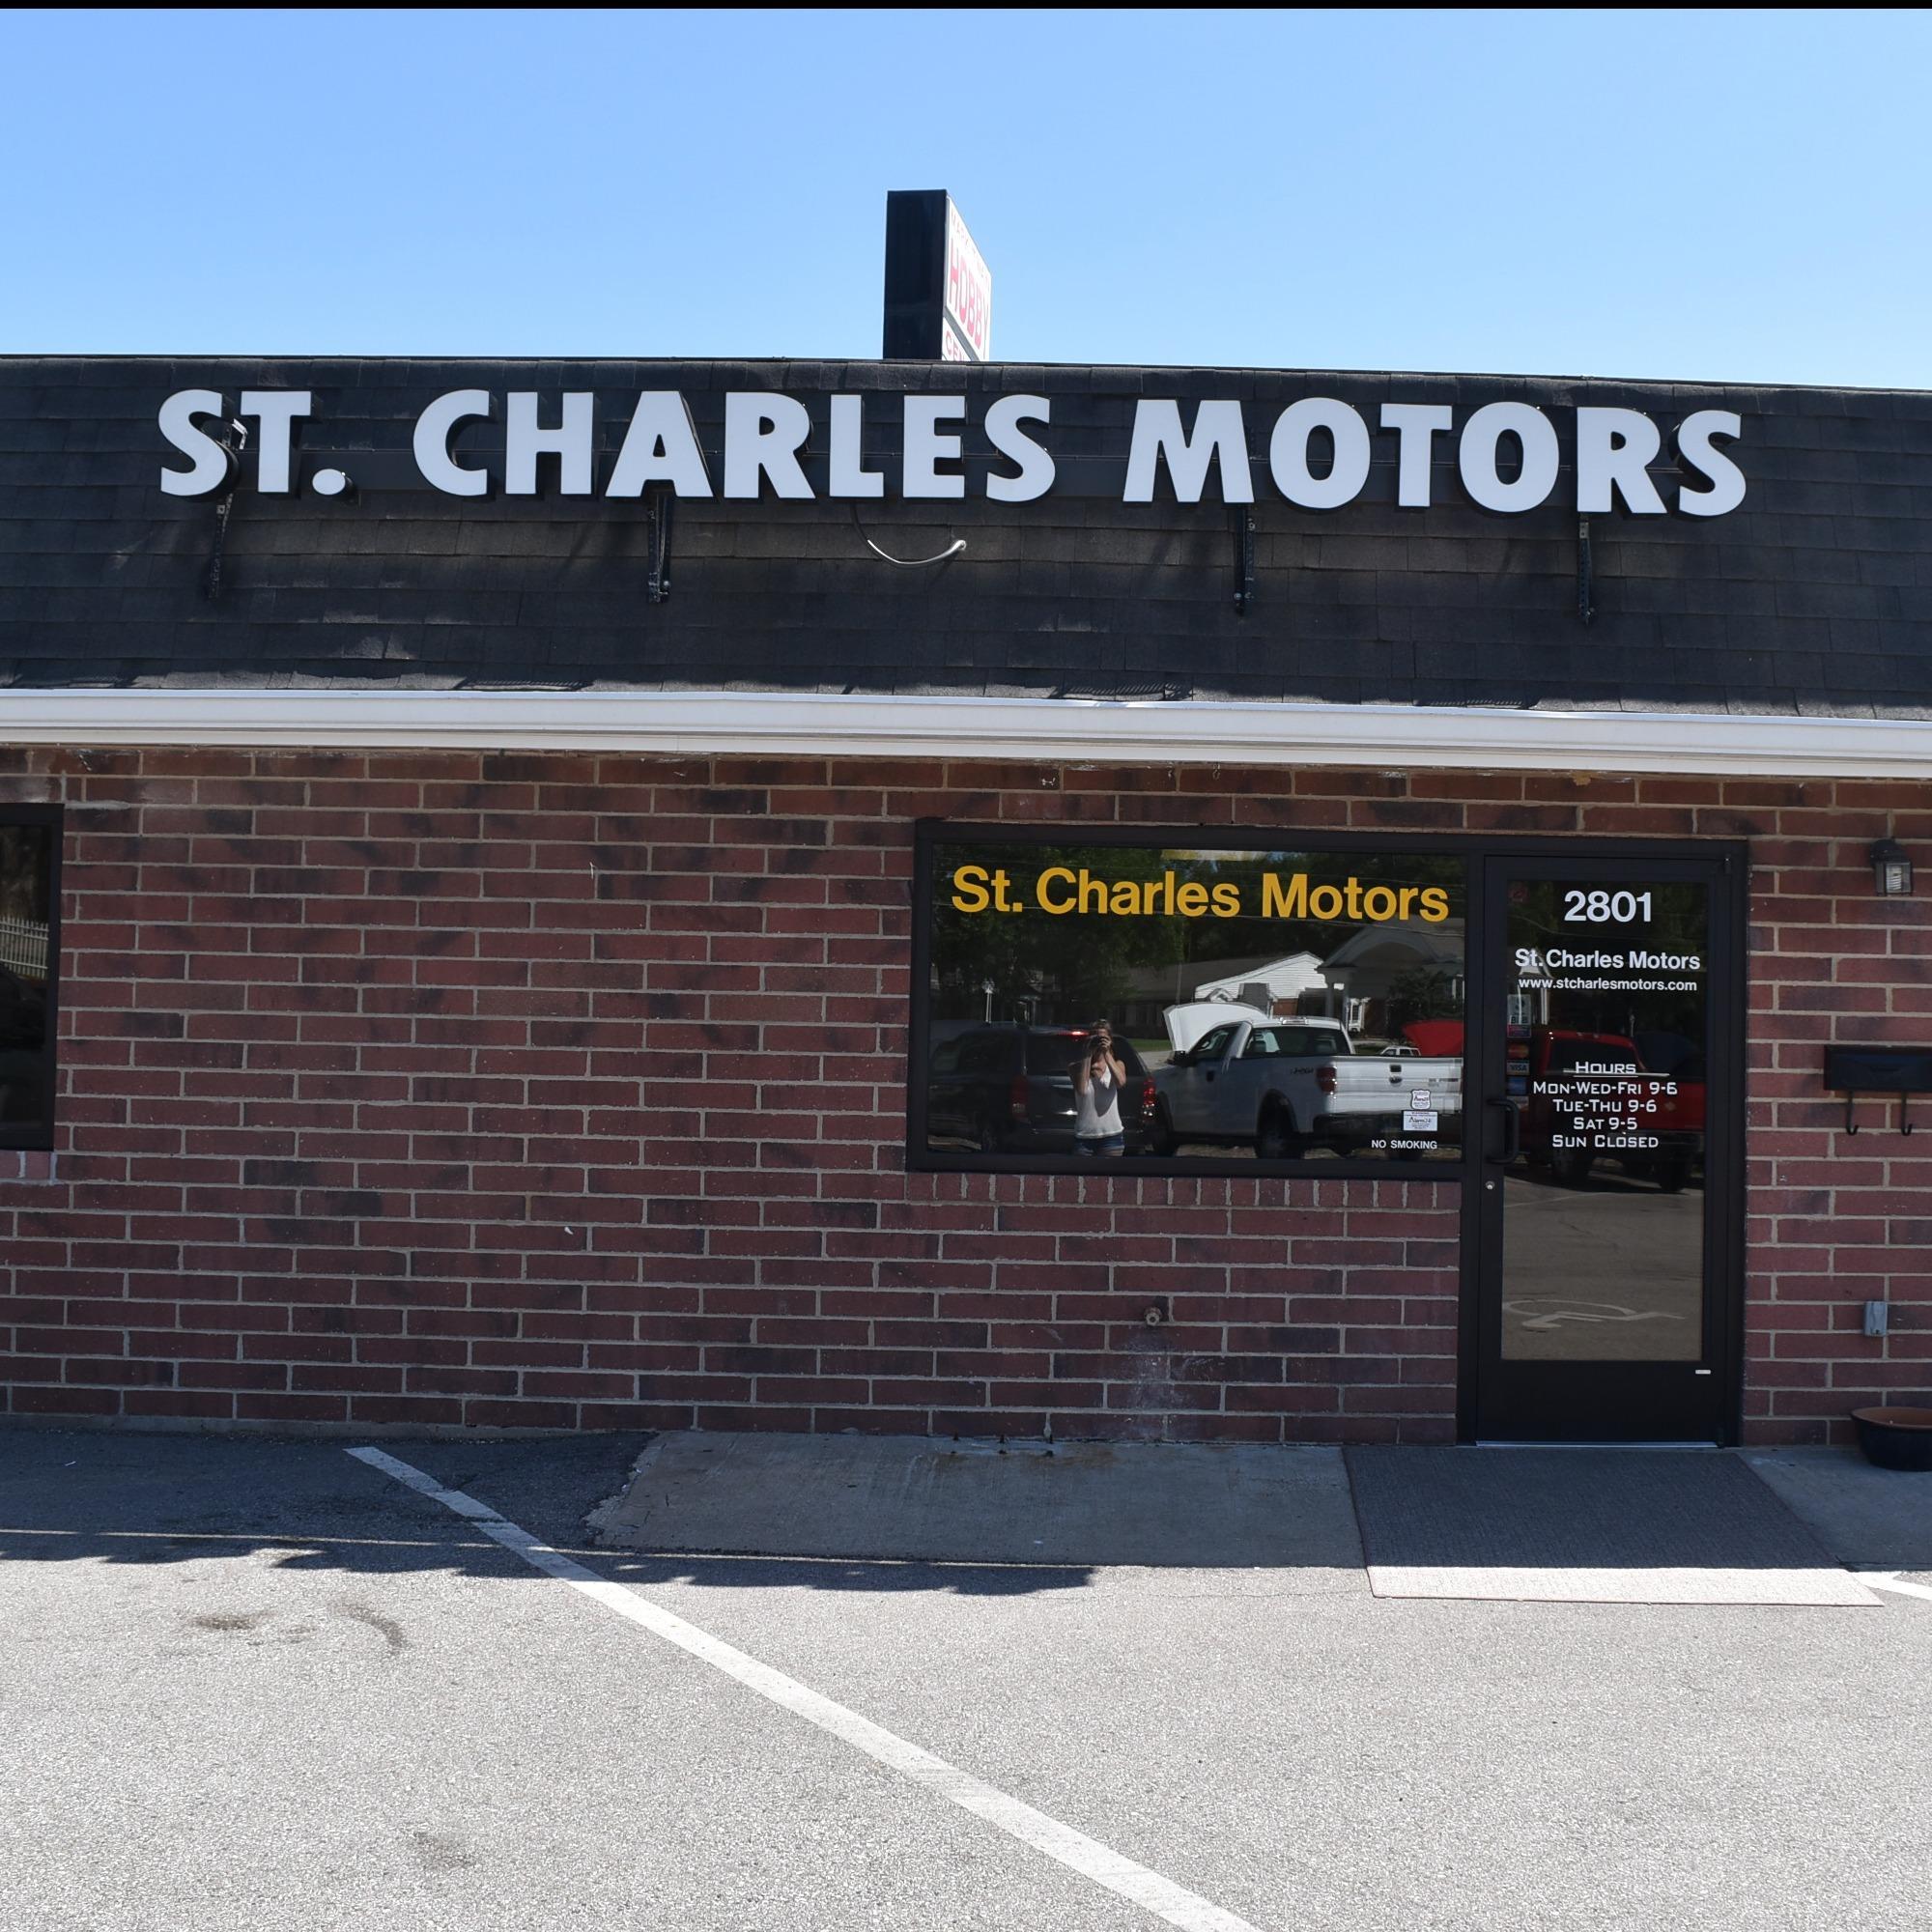 St. Charles Motors